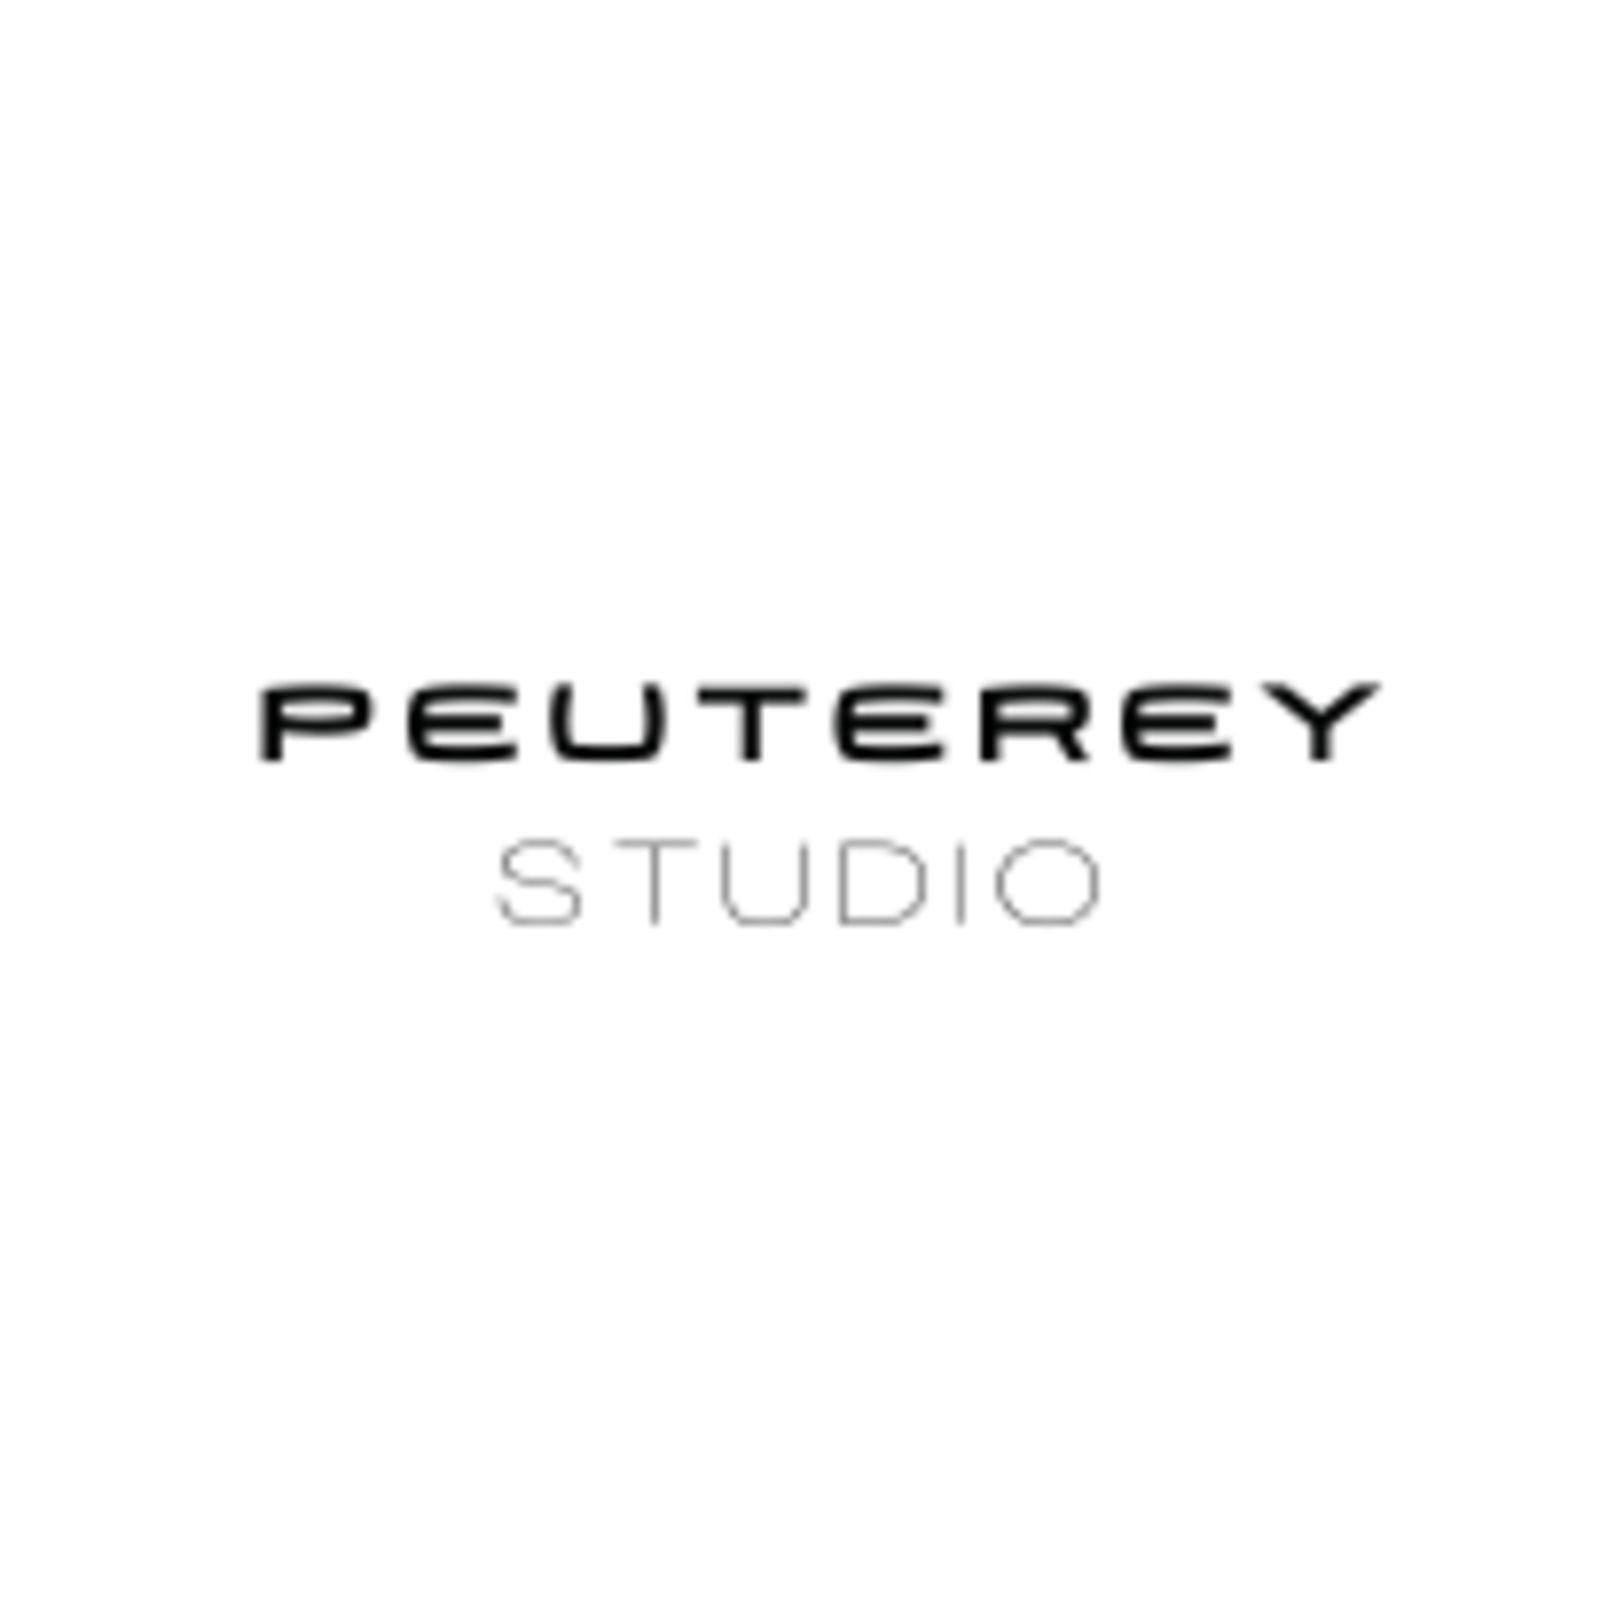 PEUTEREY STUDIO (Image 1)